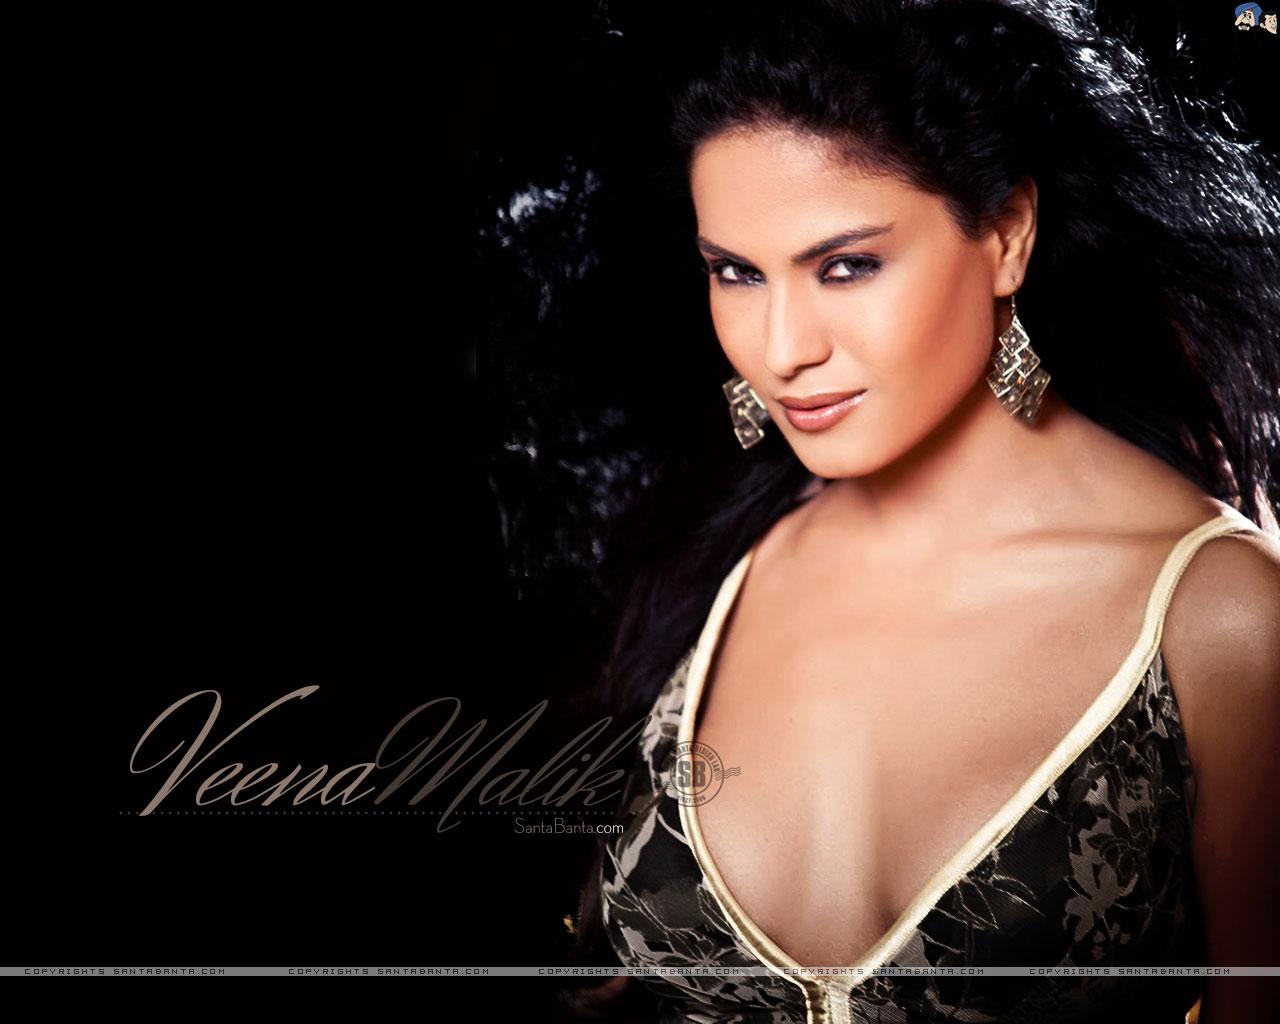 Blue pictures of veena malik Veena malik blue movie Bollywood HotSpots